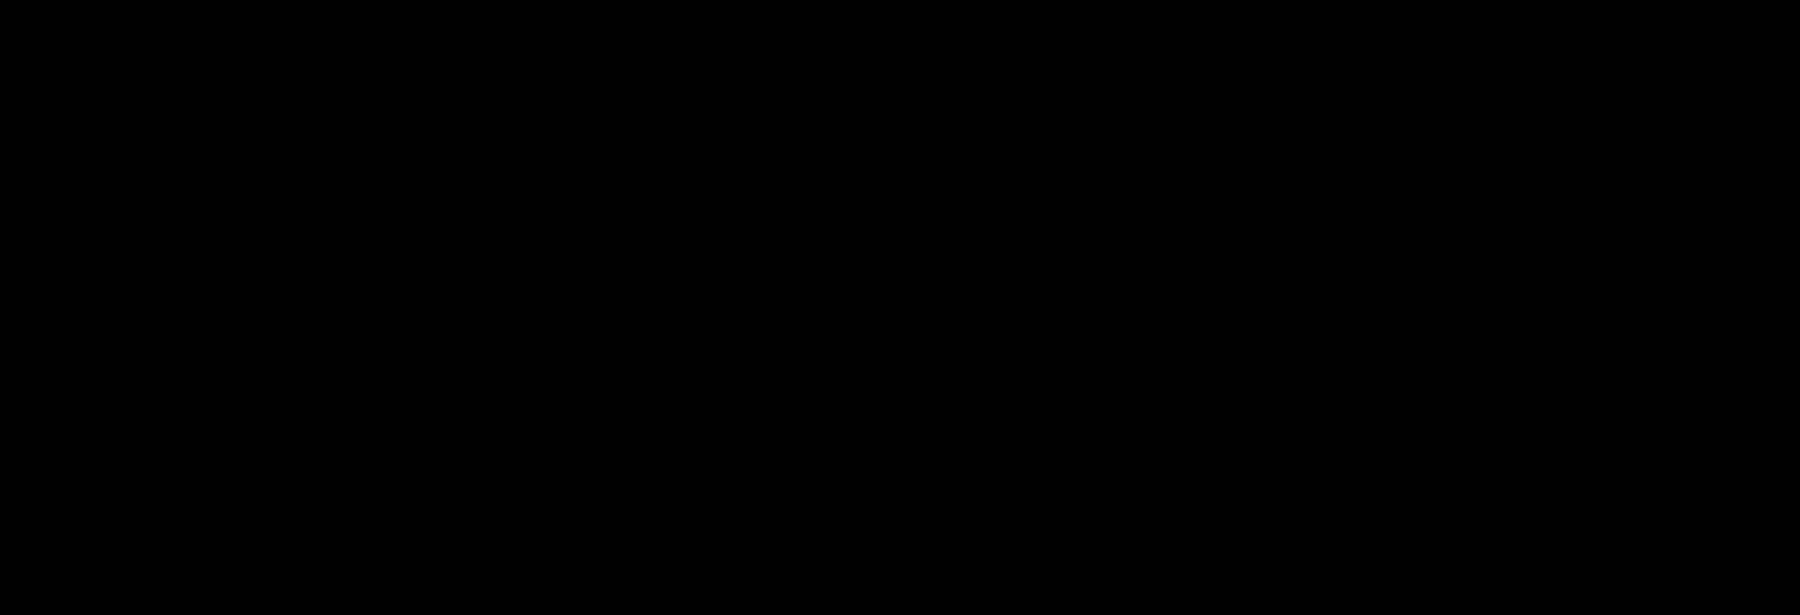 Momentum Real Estate Group logo